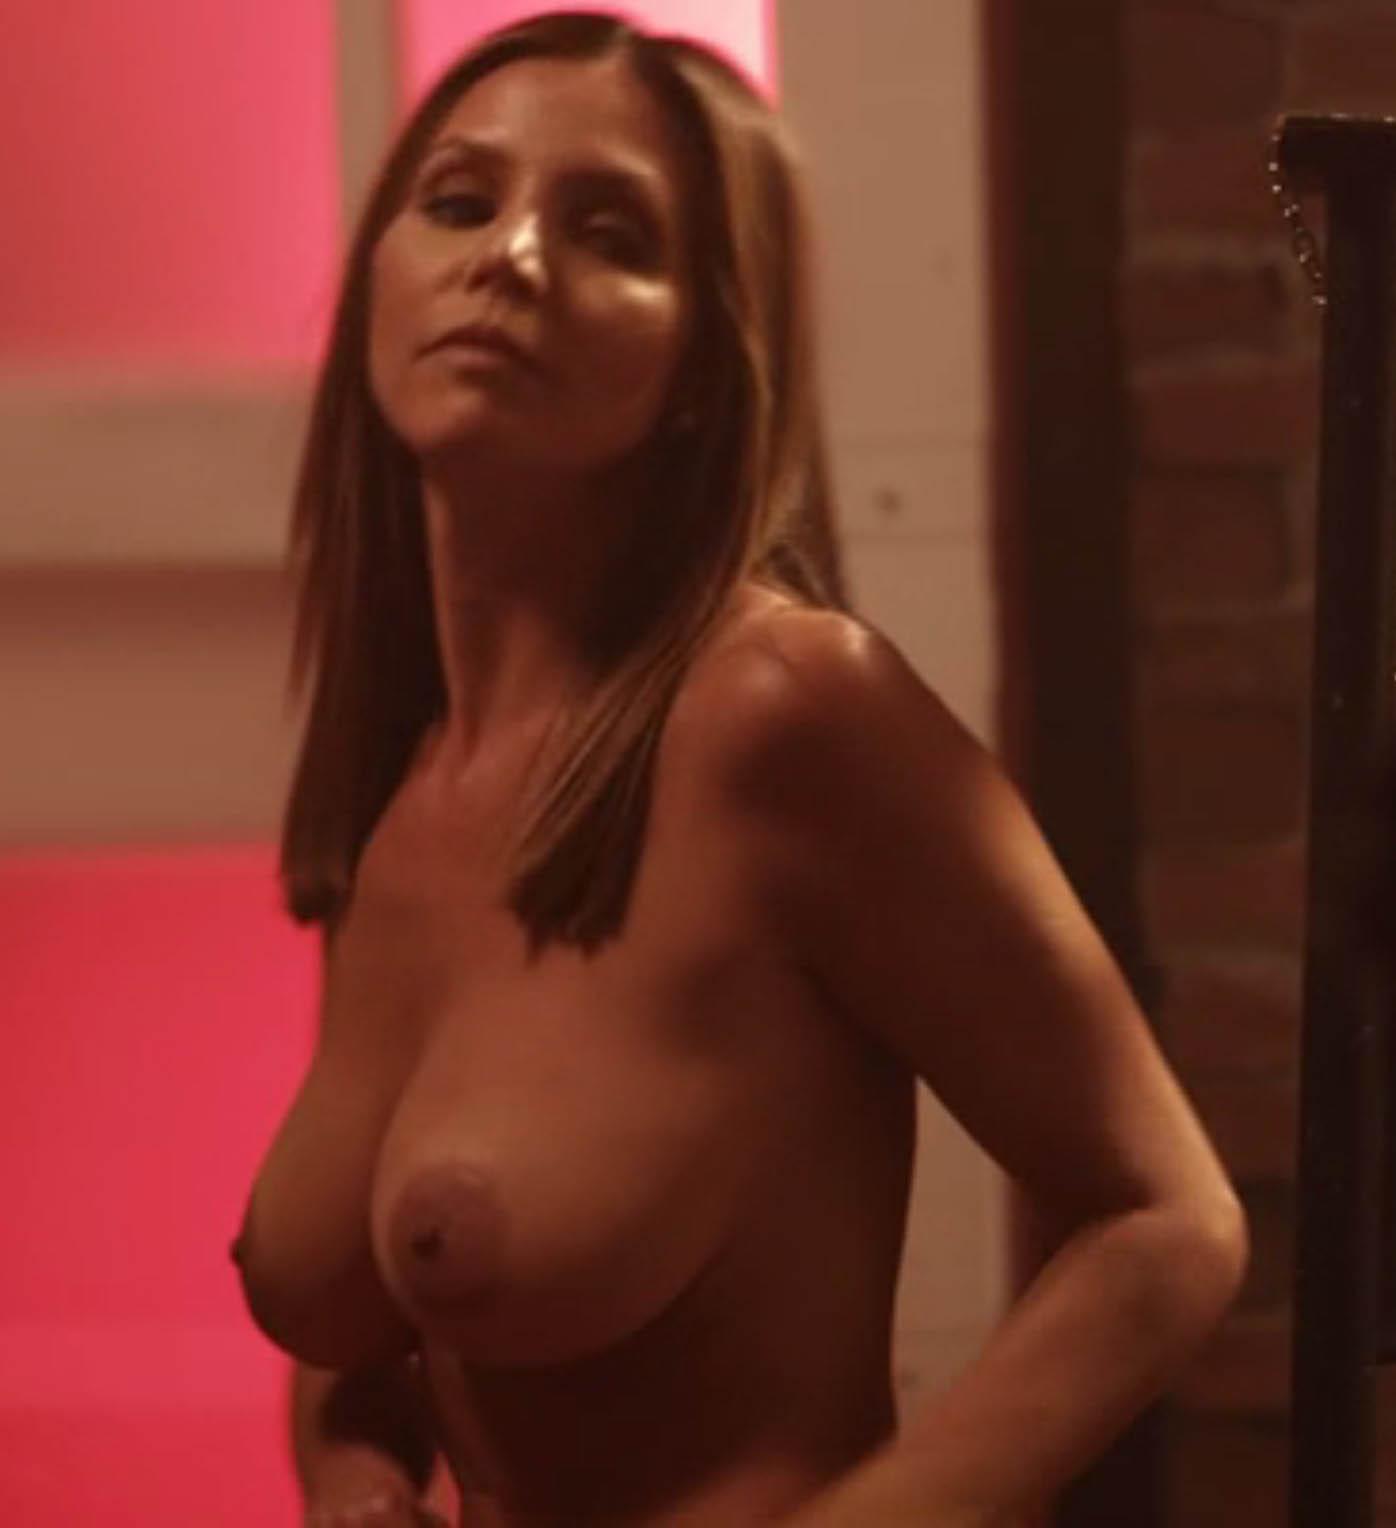 naked girl in thong